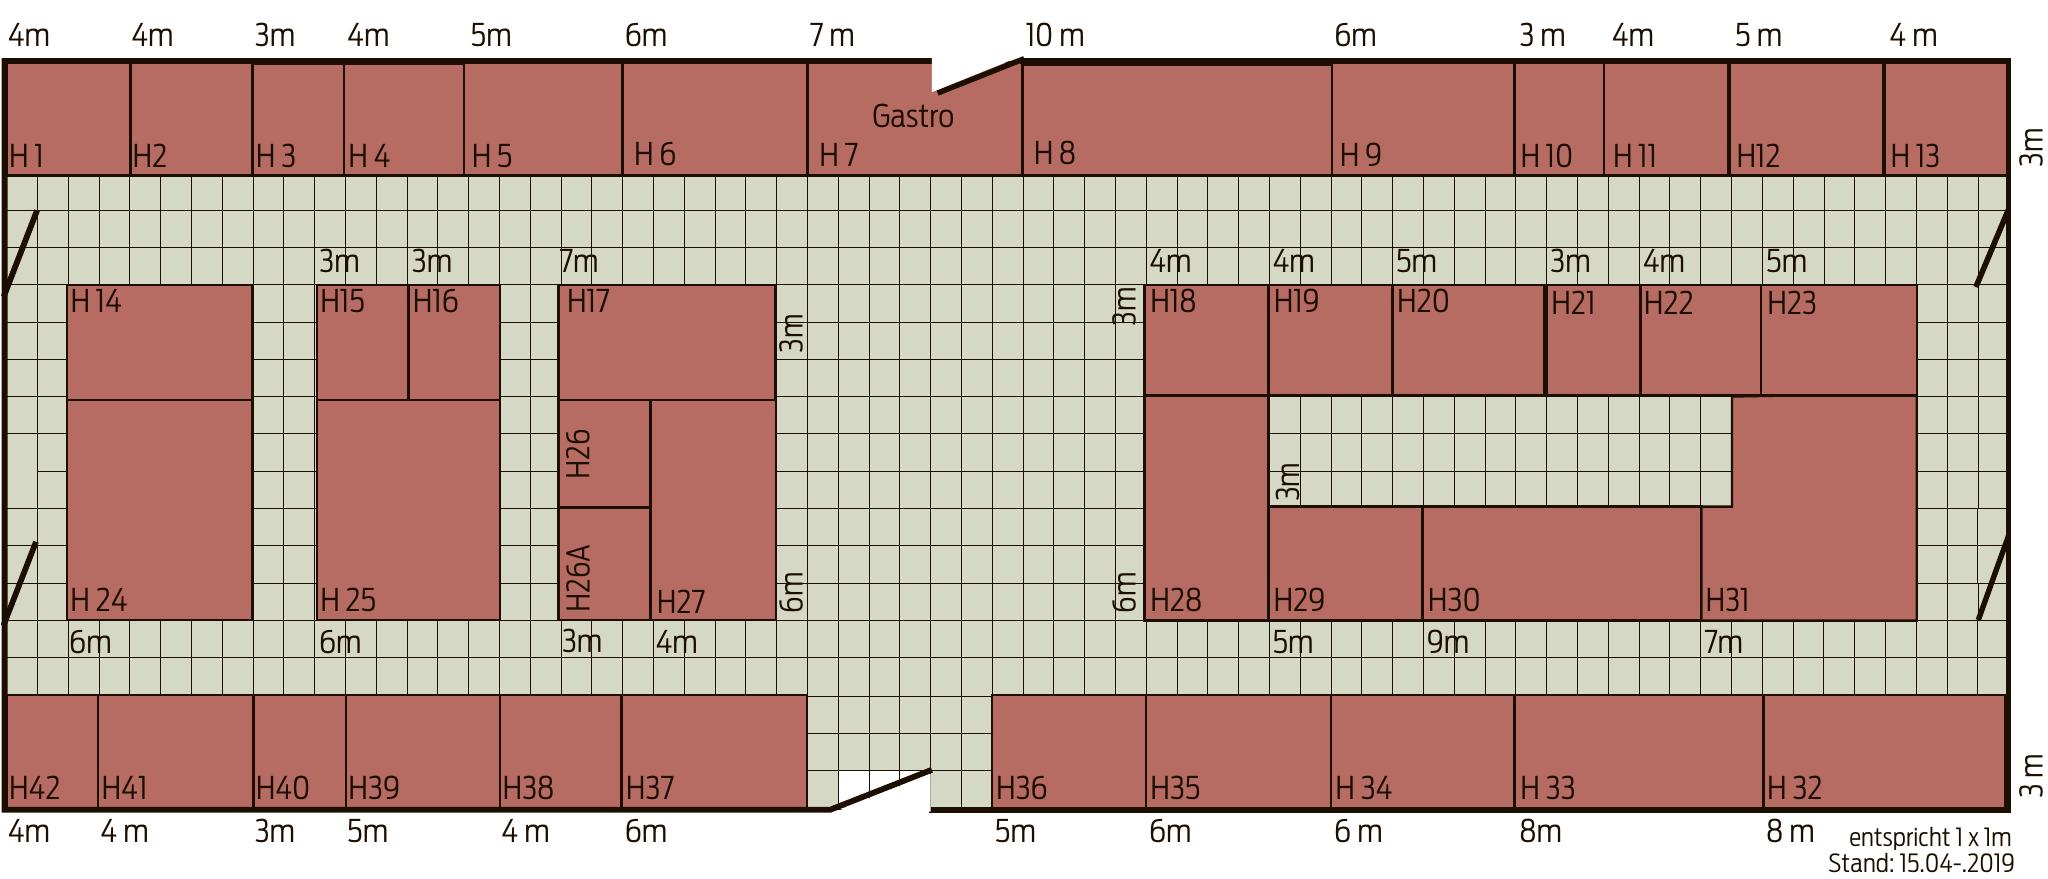 Belegungsplan Messehalle 20 x 65 m